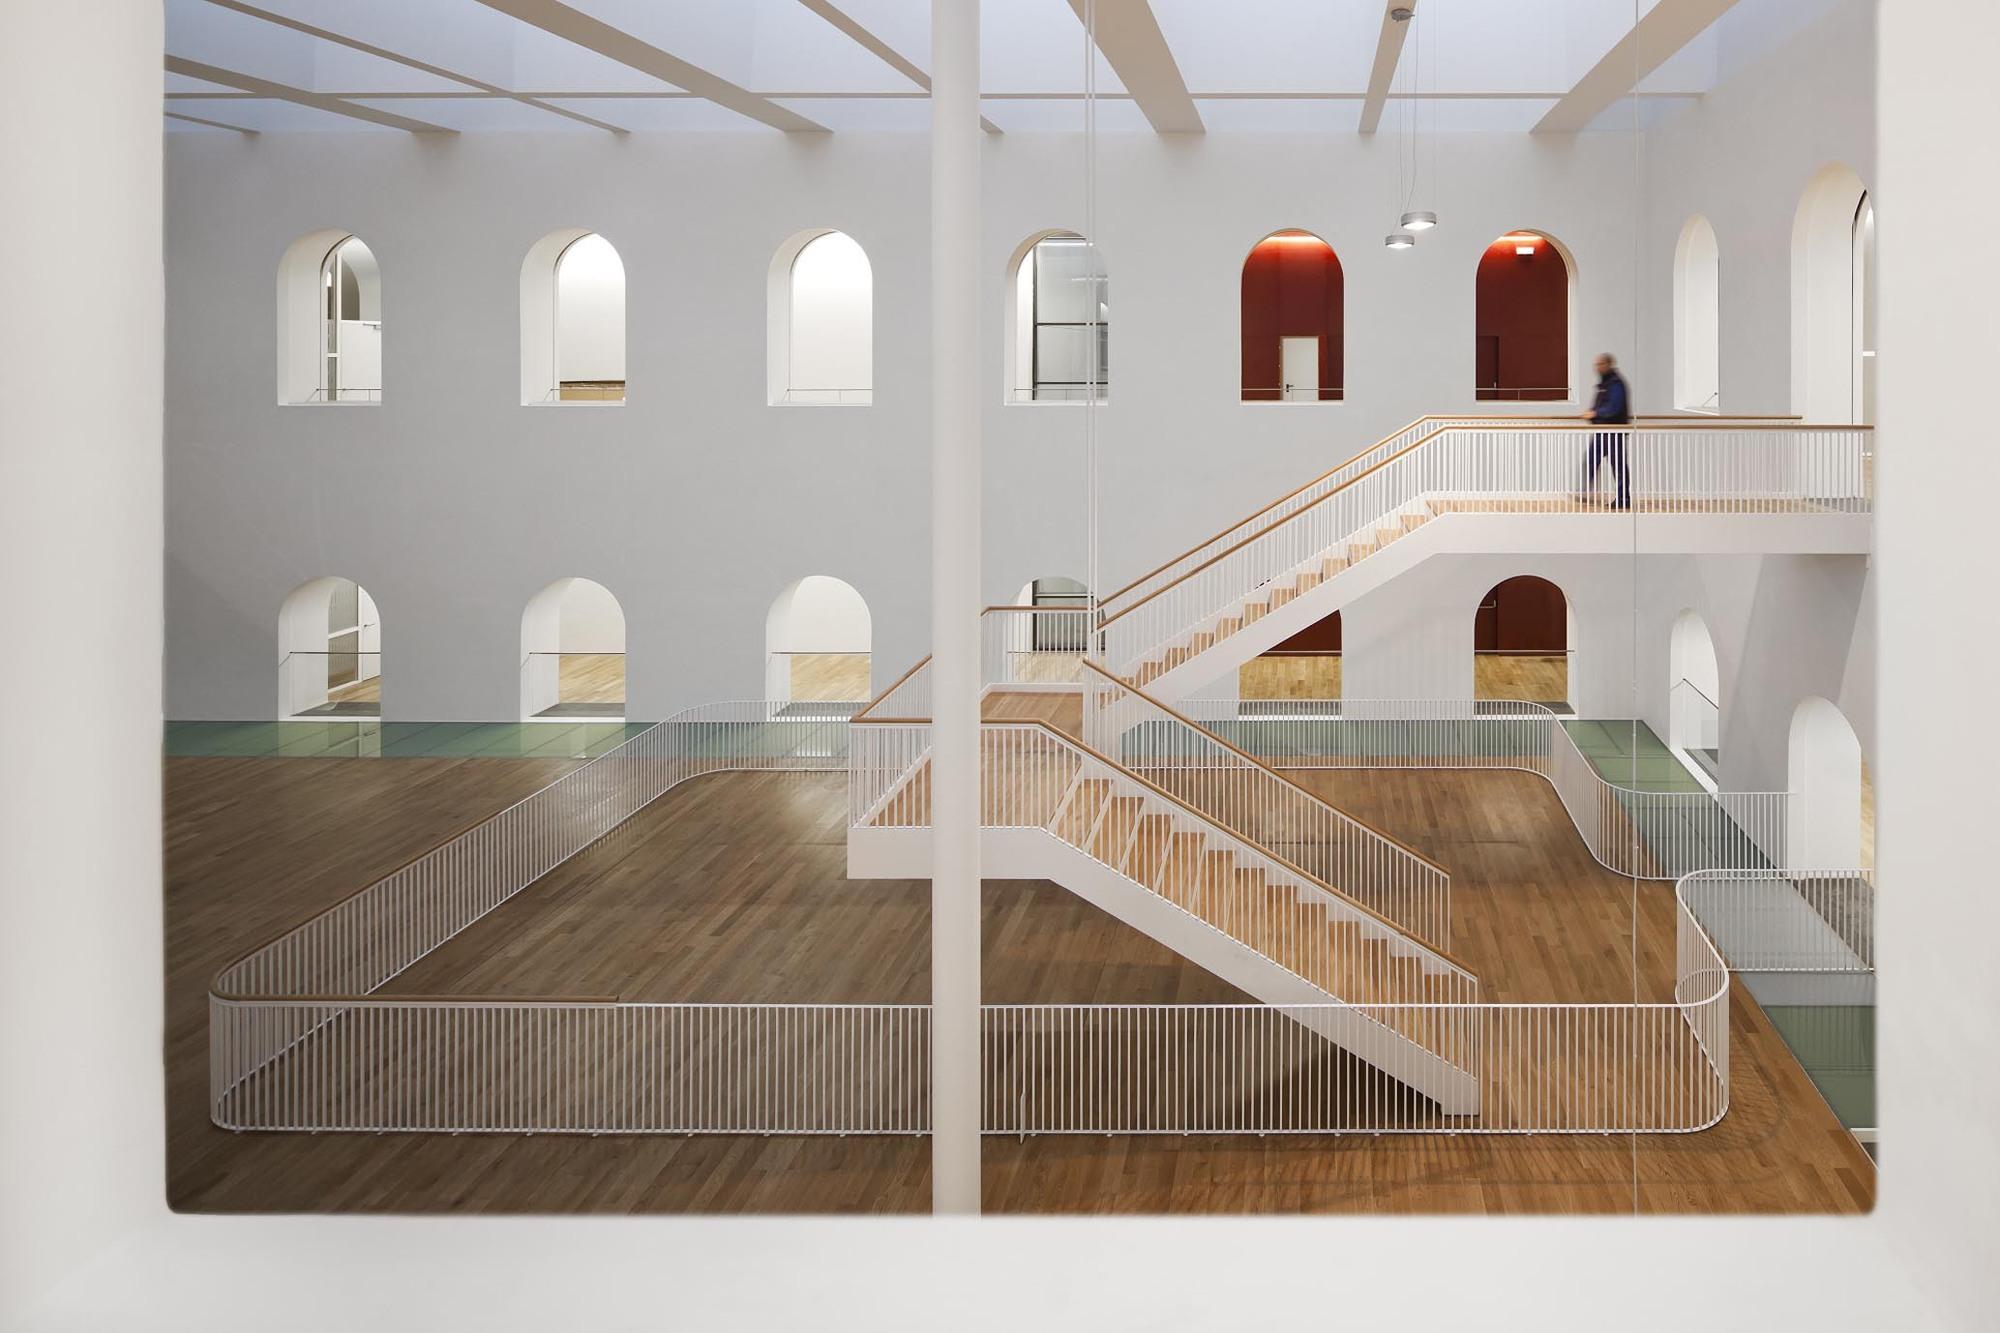 Palácio da Justiça de Burgos / Estudio Primitivo Gonzalez, © FG+SG - Fernando Guerra, Sergio Guerra